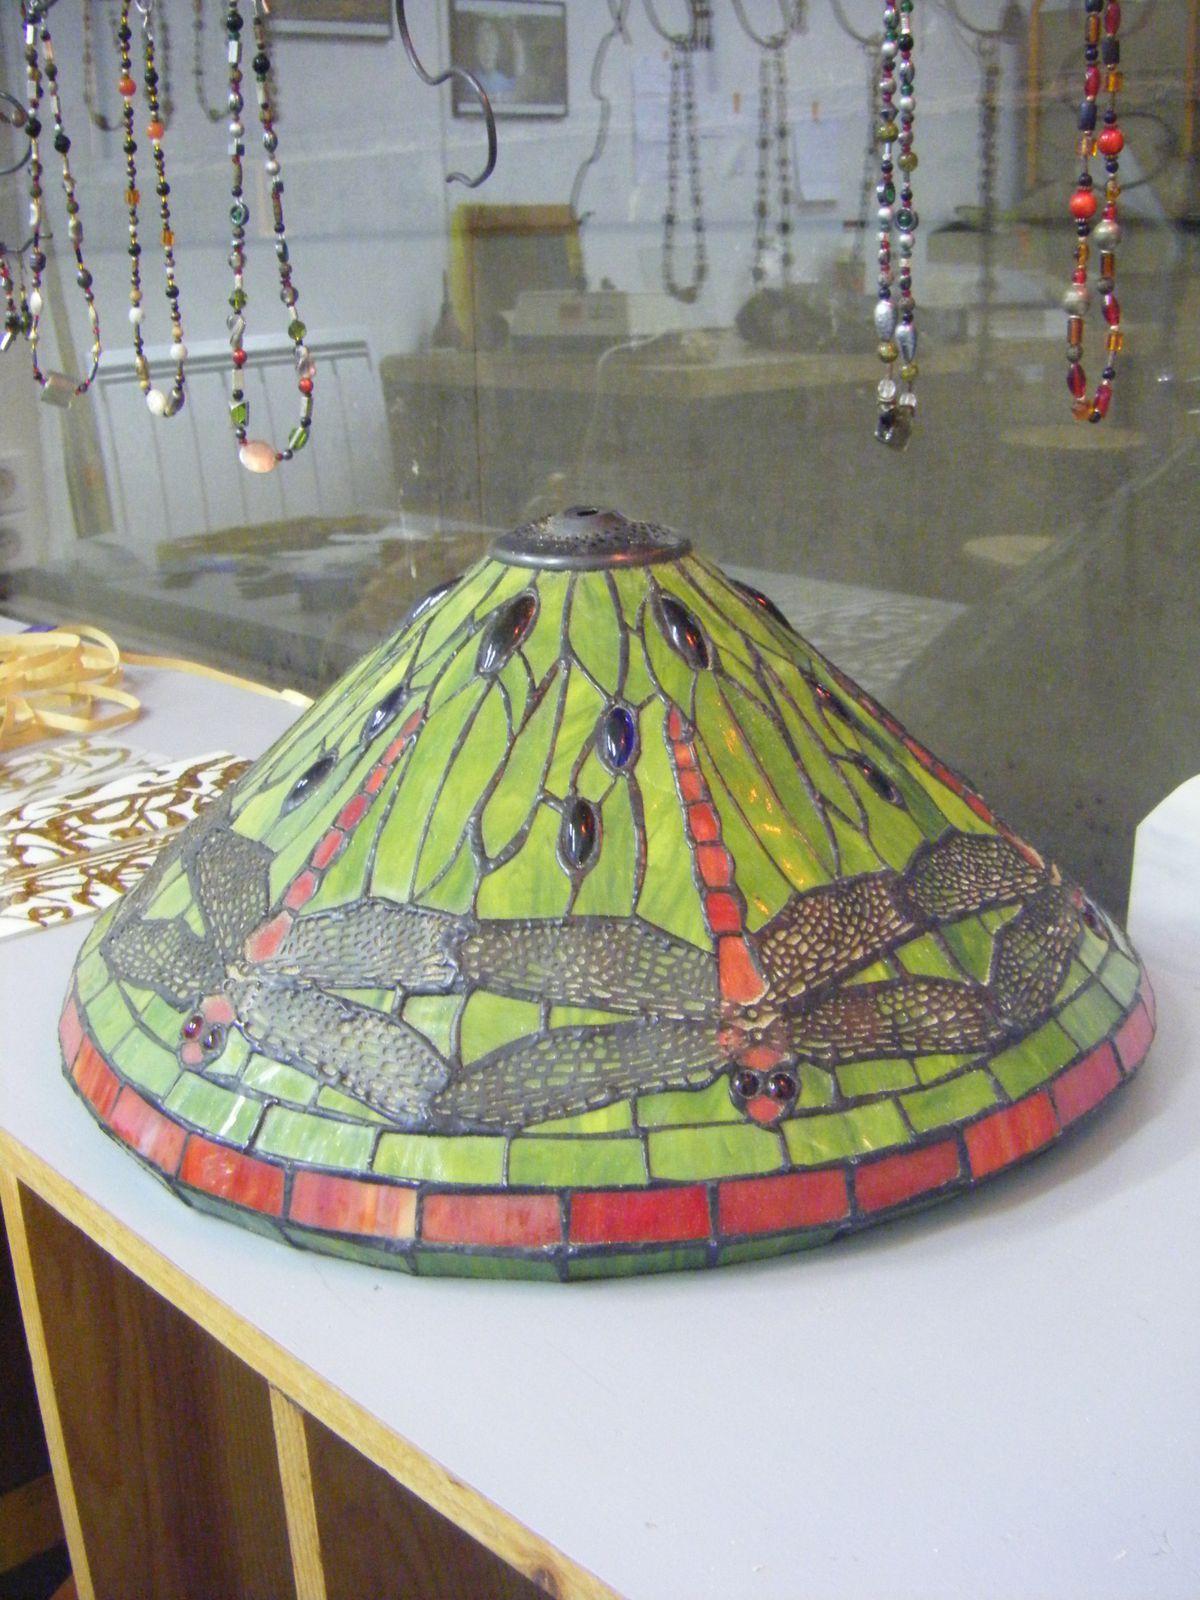 Restauration lampes tiffany le blog d 39 adriana bellamy - Lampe pipistrello copie ...